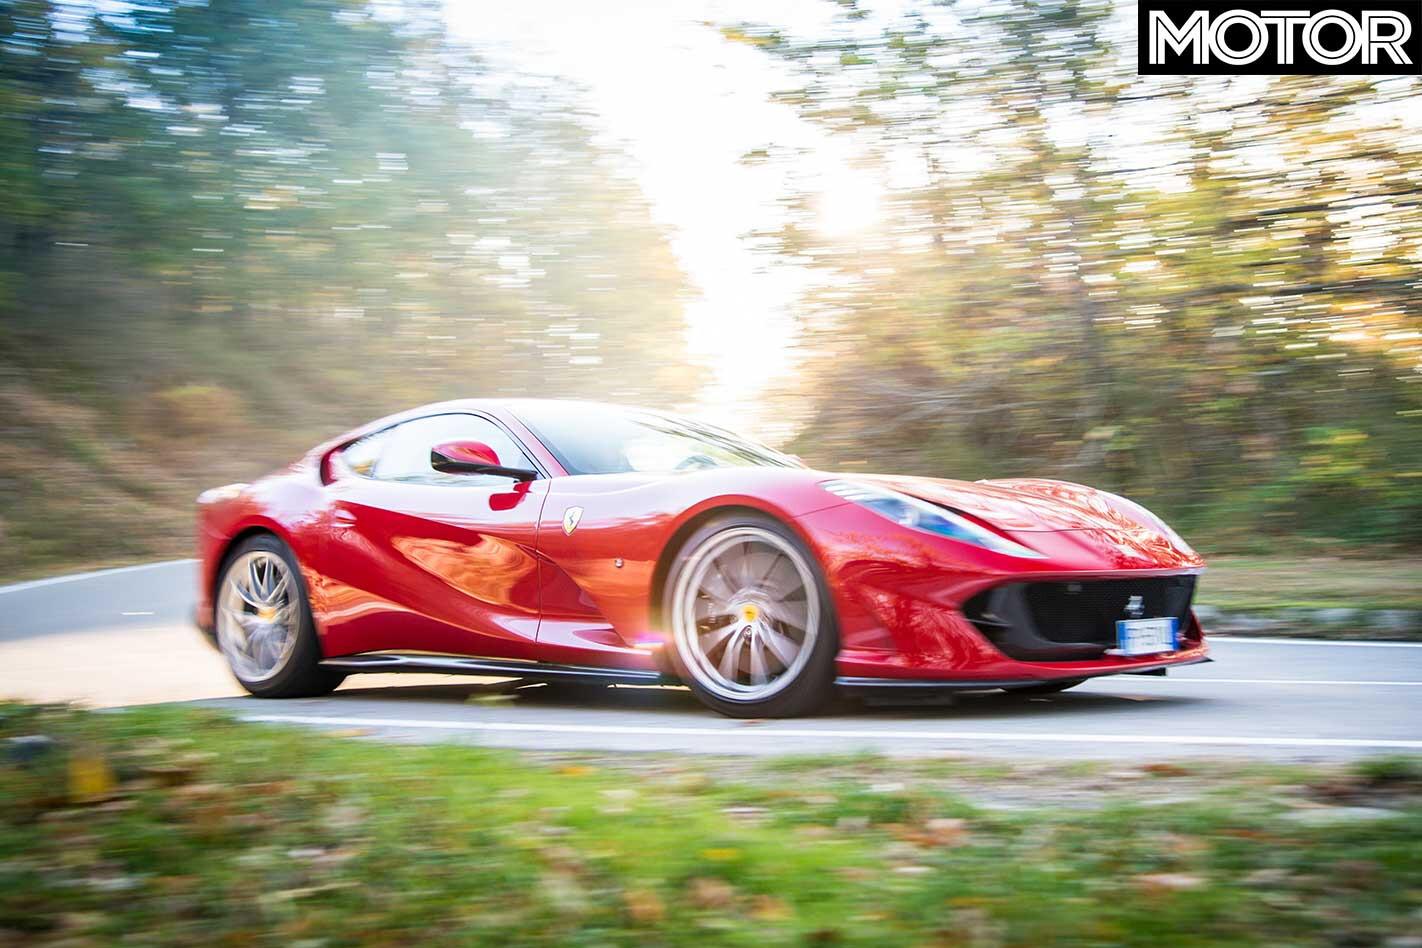 2019 Ferrari 812 Superfast Cornering Jpg